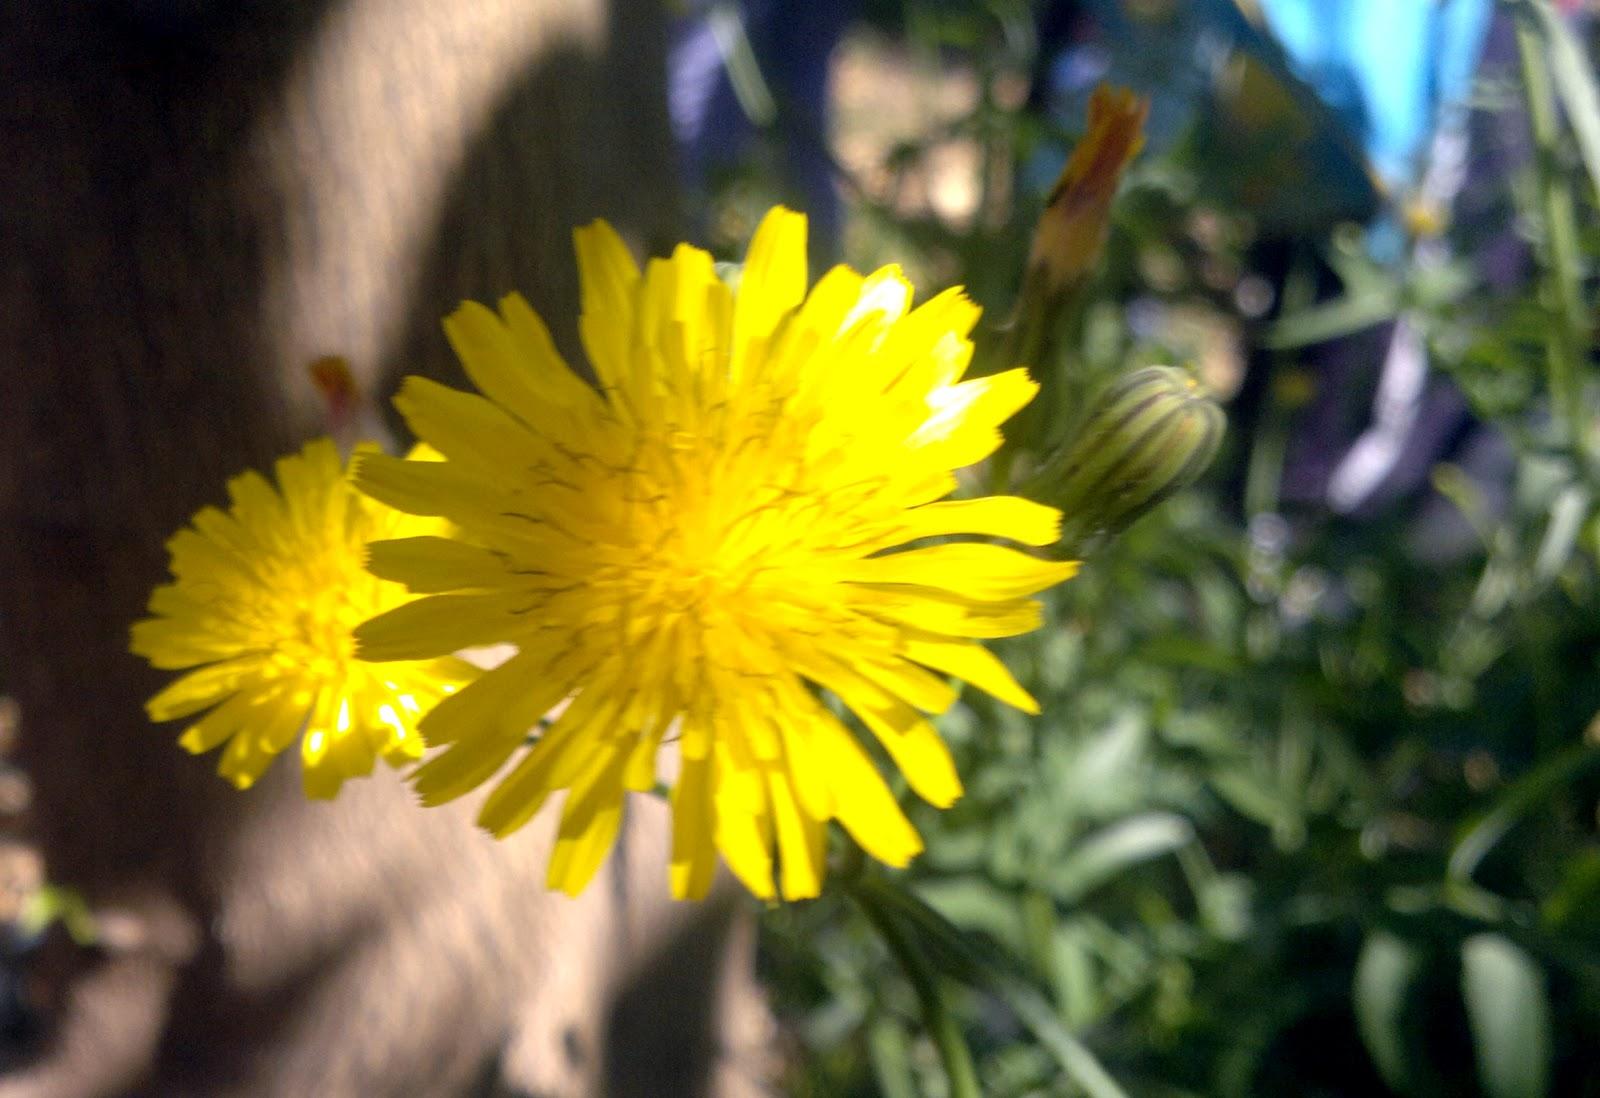 Crea tu jard n vetada la miel espa ola en europa por los for Crea tu jardin